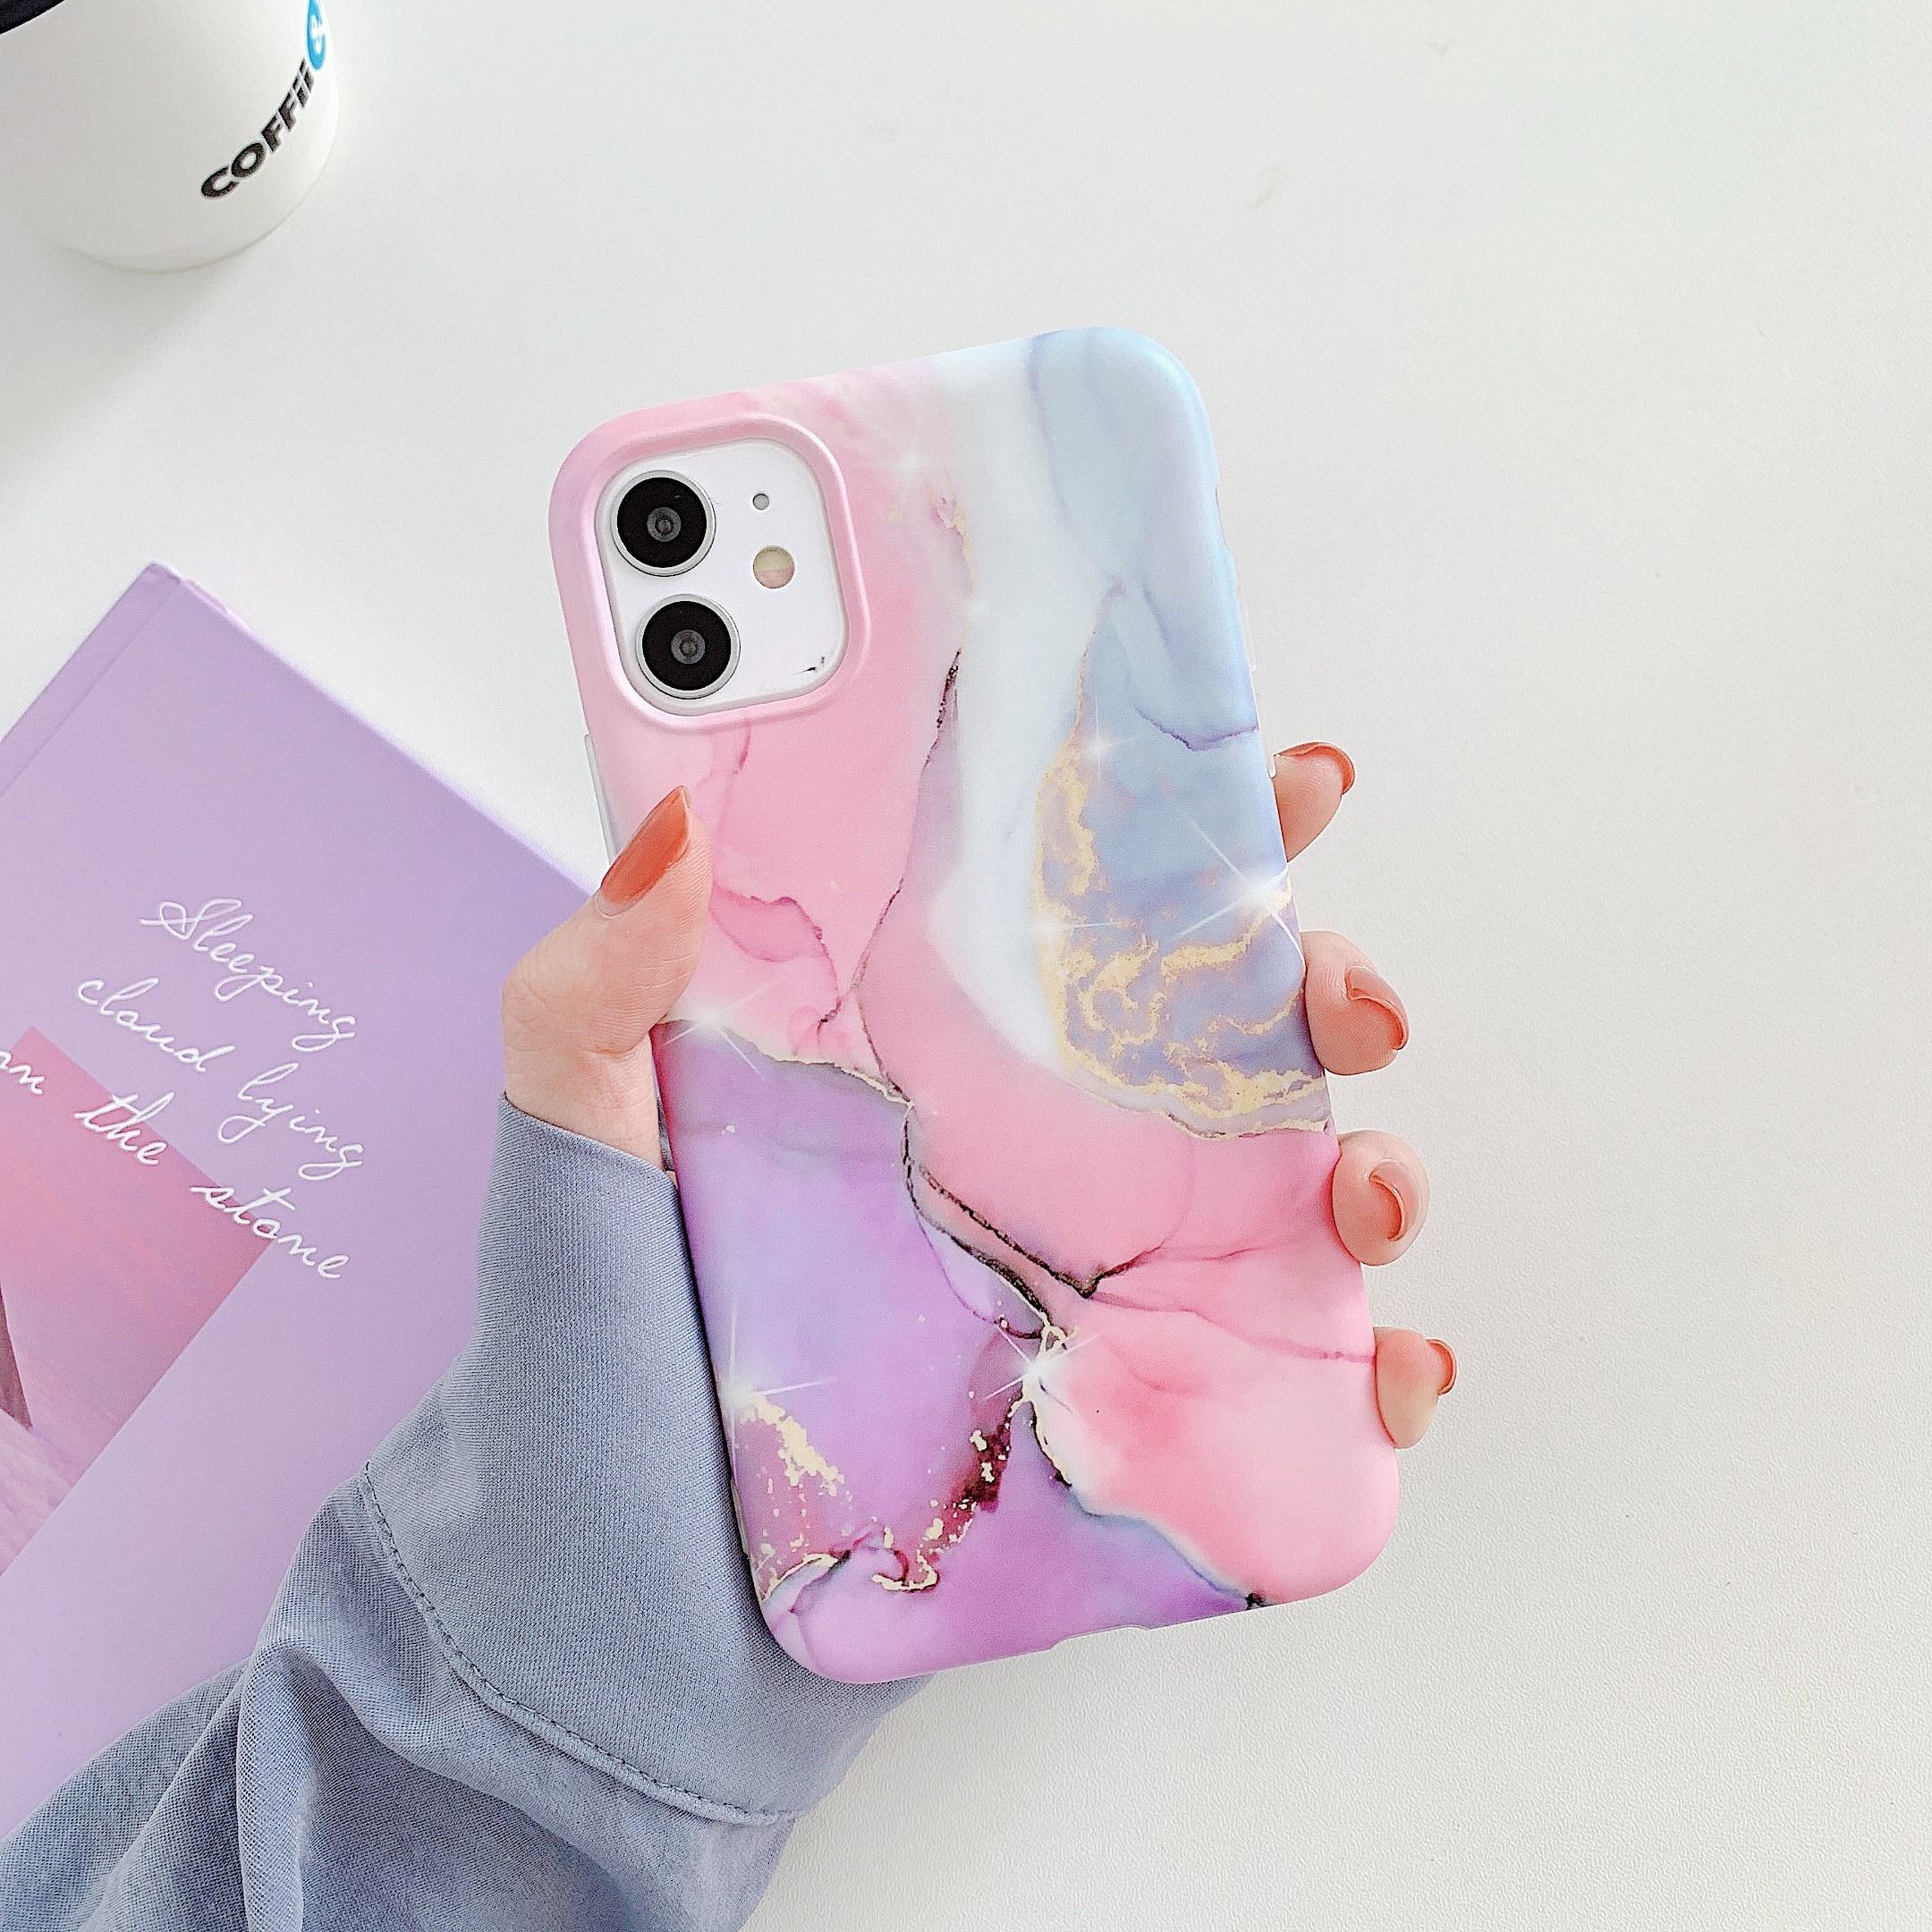 Hfb24de2857ba4005b60151b9e177a7b1f Capinha celular case Mármore rachadura matte casos de telefone para iphone 12 mini 11 pro max se 2020 xs max xr x 7 8 plus capa de silicone macio tpu imd volta